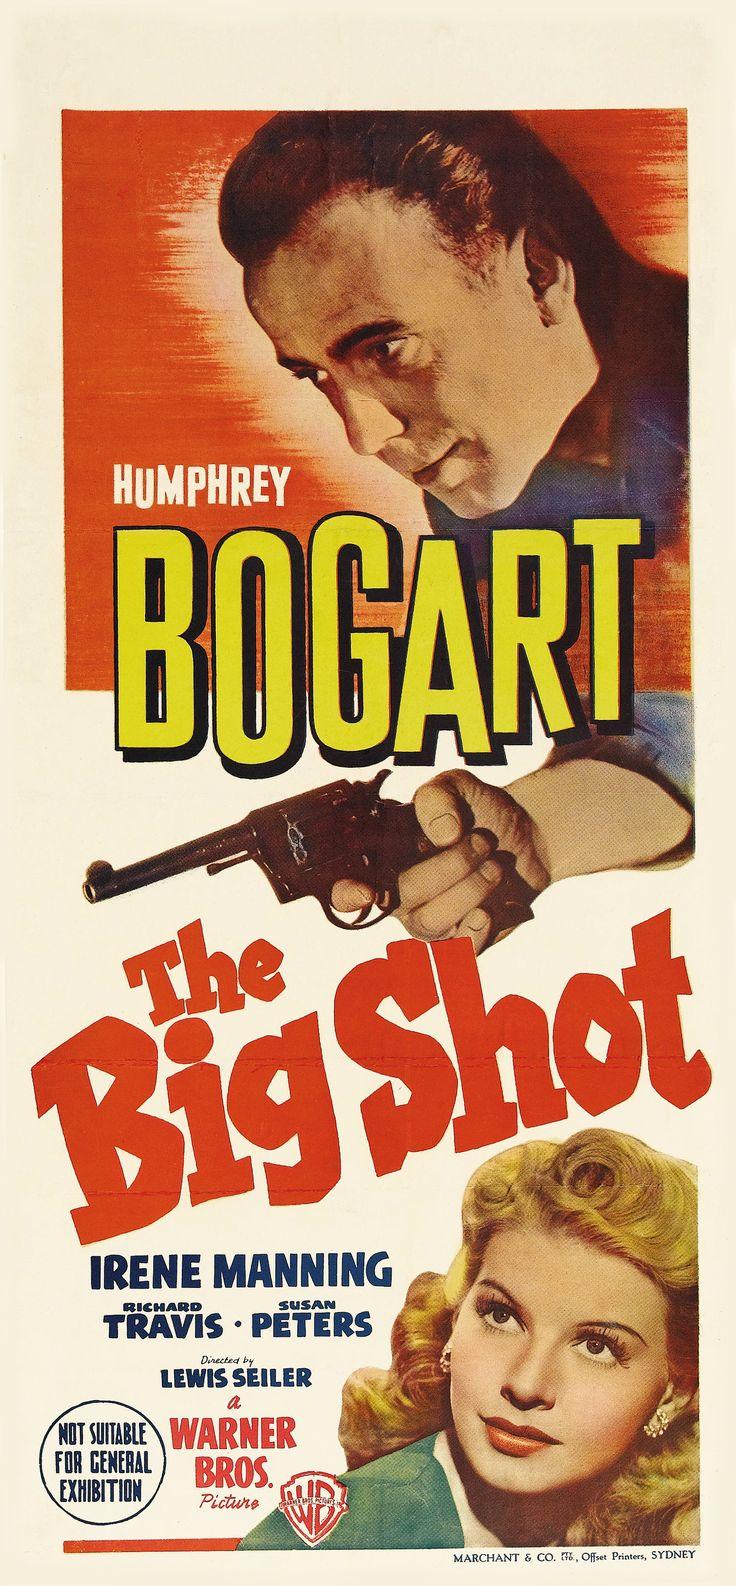 The Big Shot (1942) Starring Humphrey Bogart, Irene Manning, Richard Travis and Susan Peters Movie Poster https://www.youtube.com/user/PopcornCinemaShow